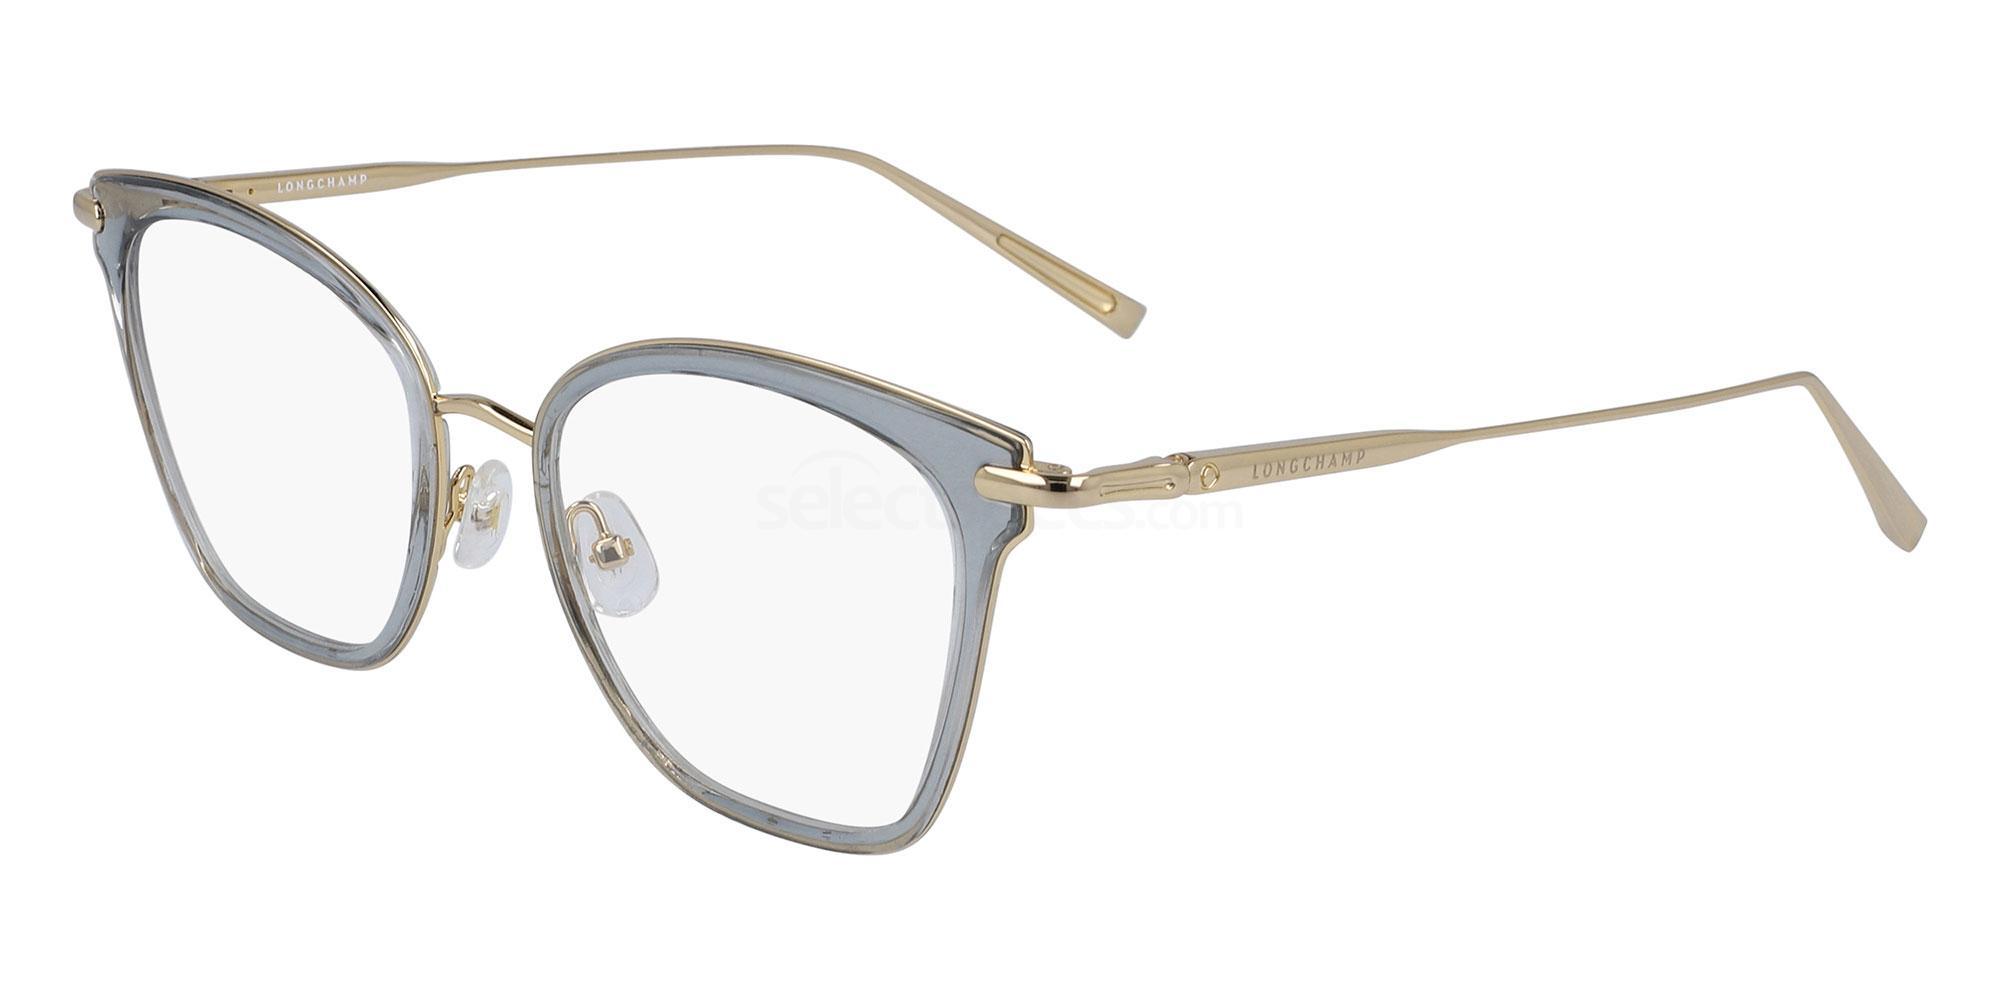 036 LO2635 Glasses, LONGCHAMP